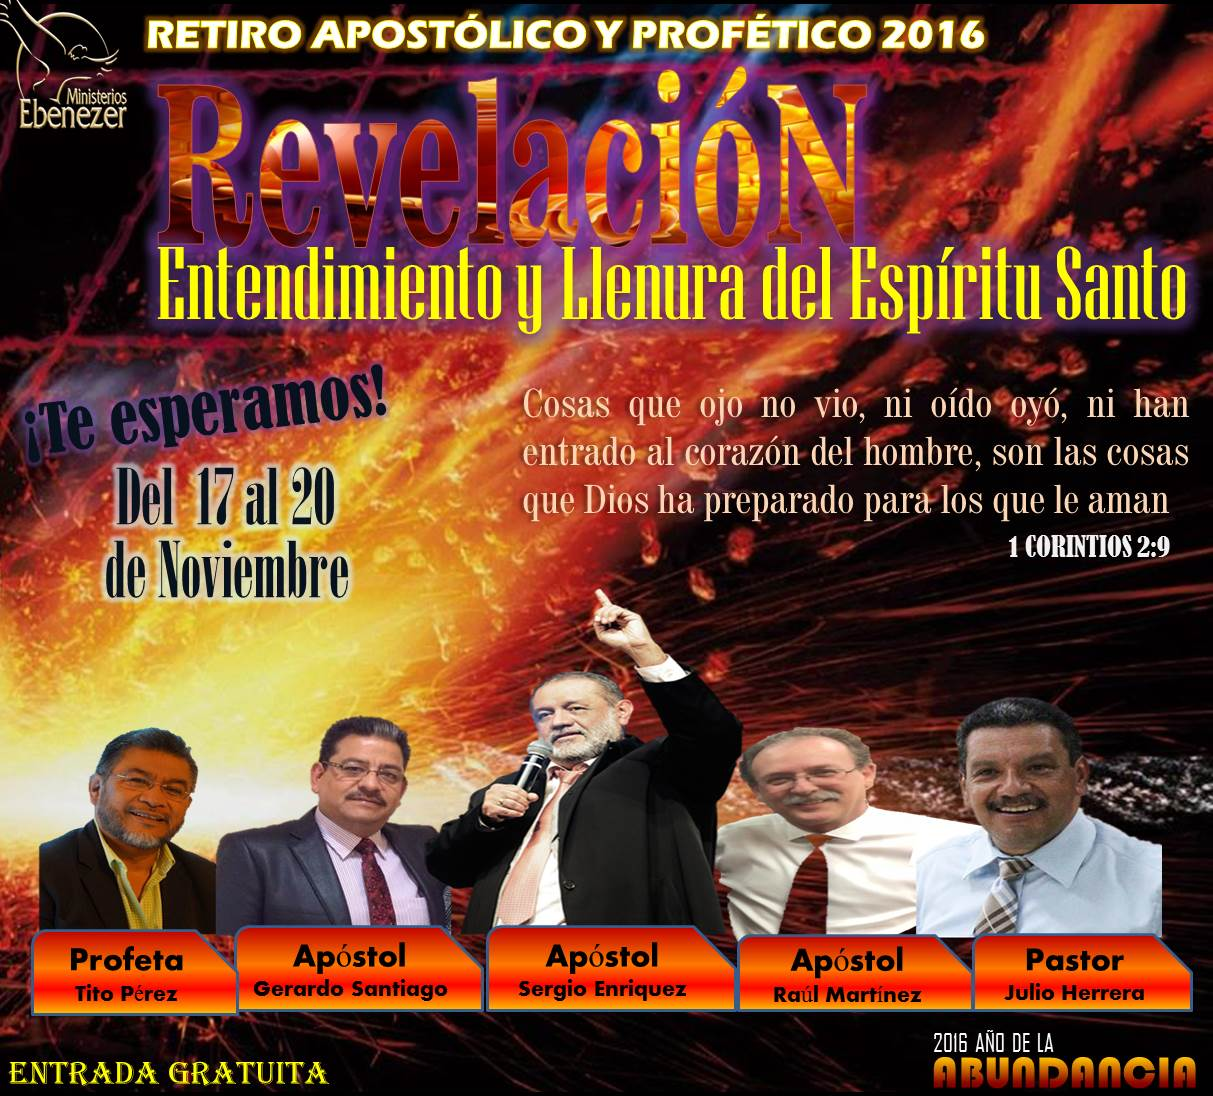 Retiro Apostólico y Profético 2016